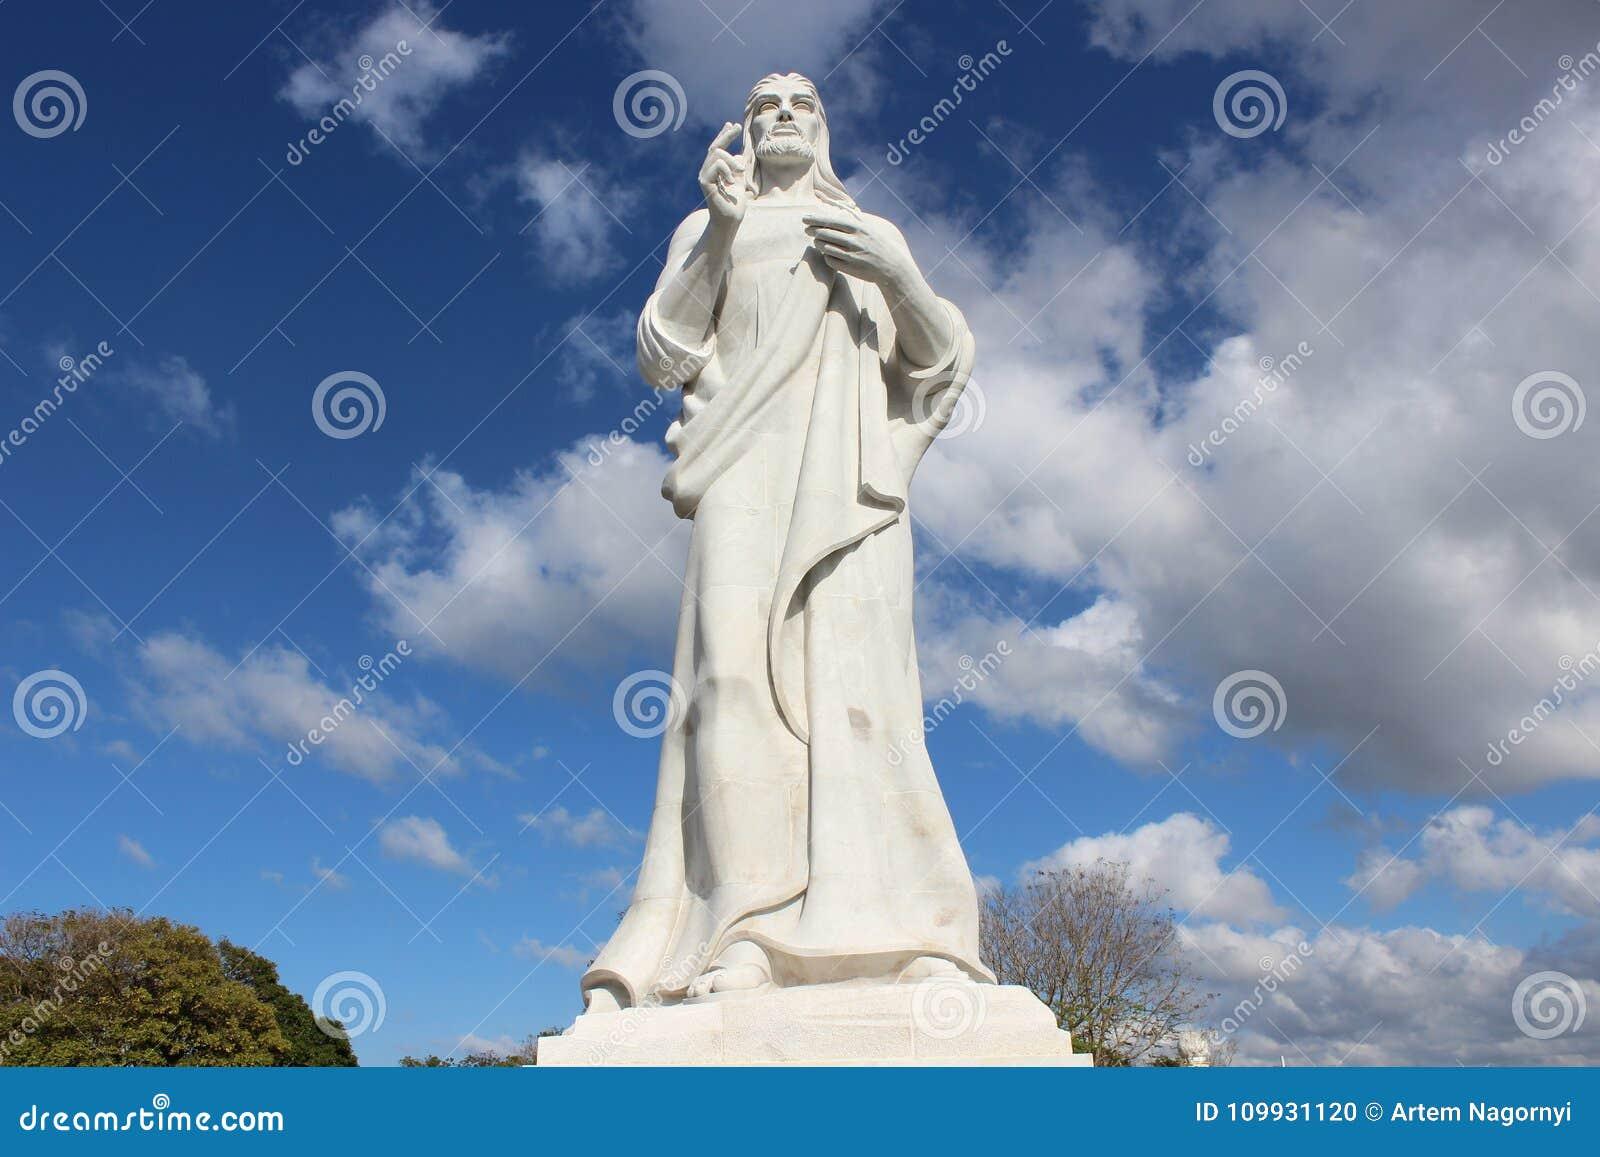 Statue von Jesus Christ in Havana, Kuba